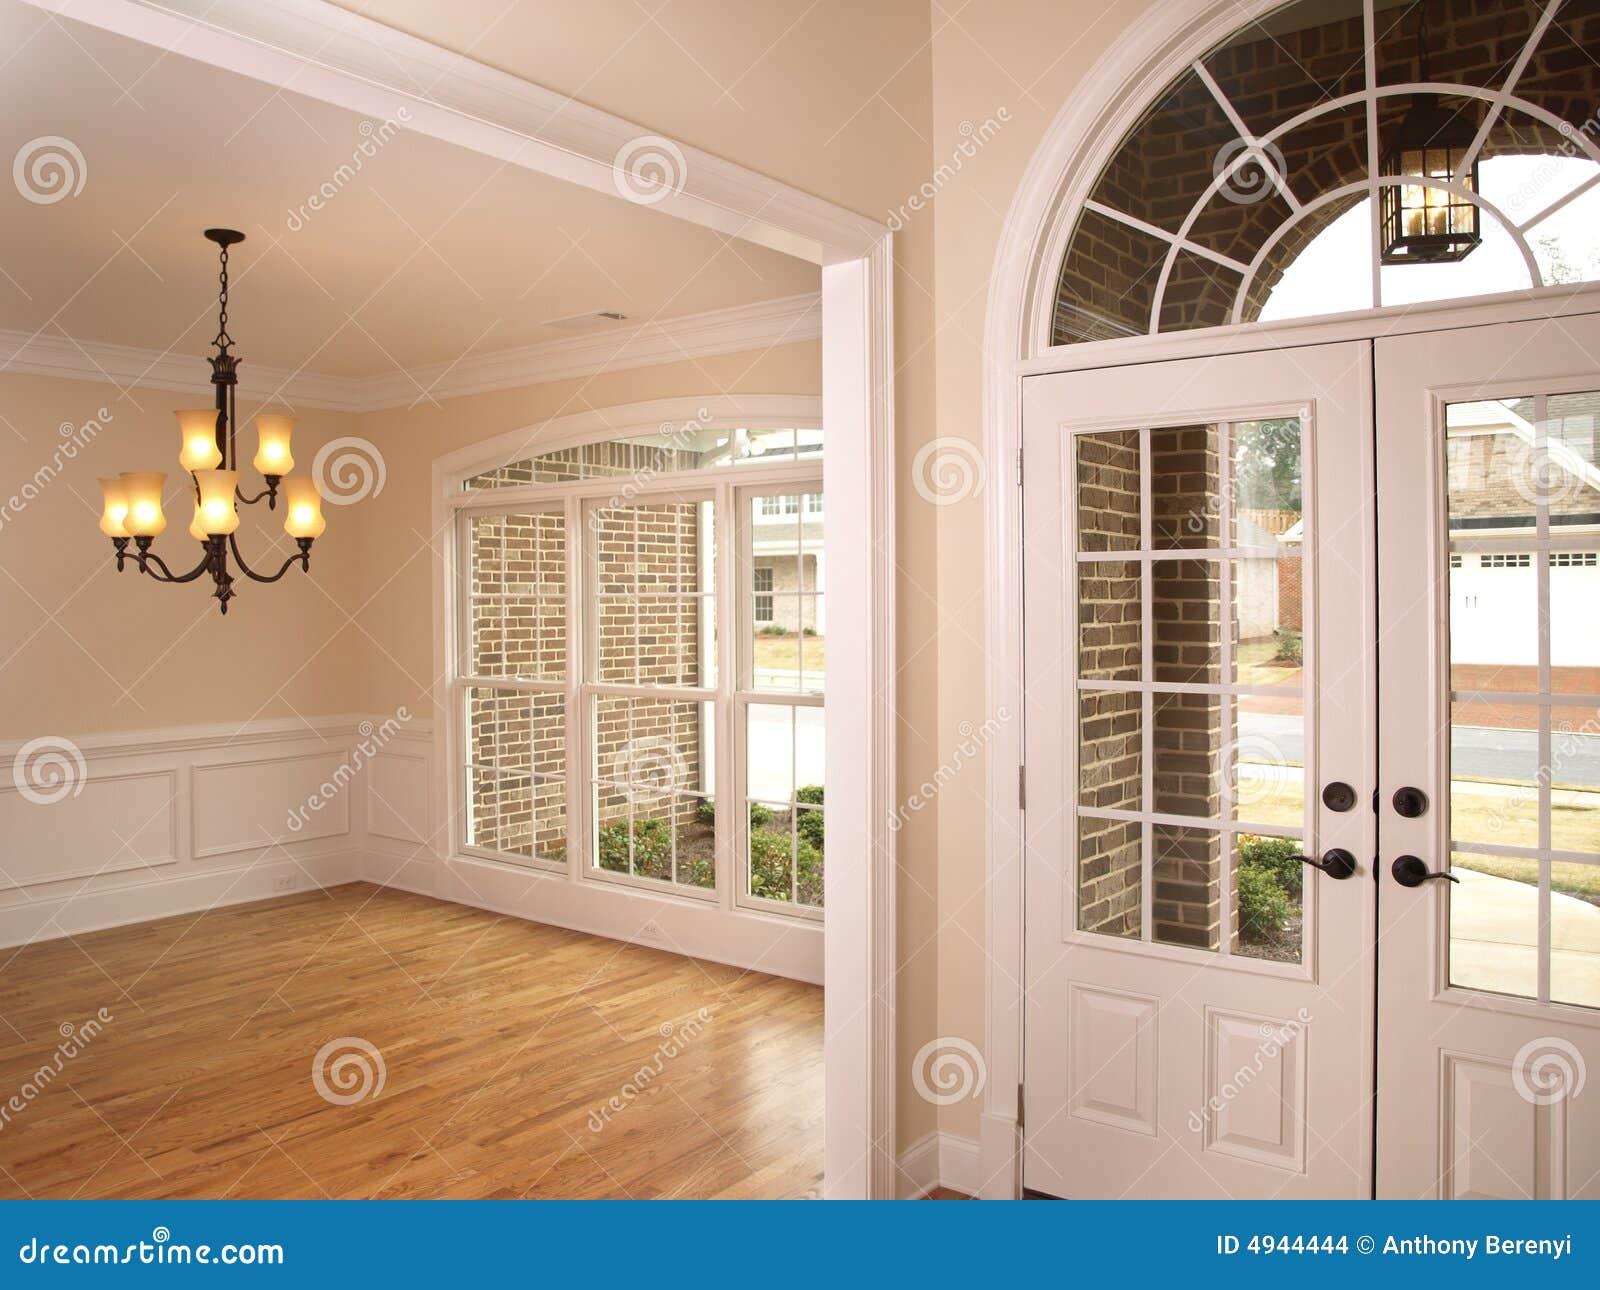 Luxury Glass Door : Luxury foyer with arched glass door stock images image